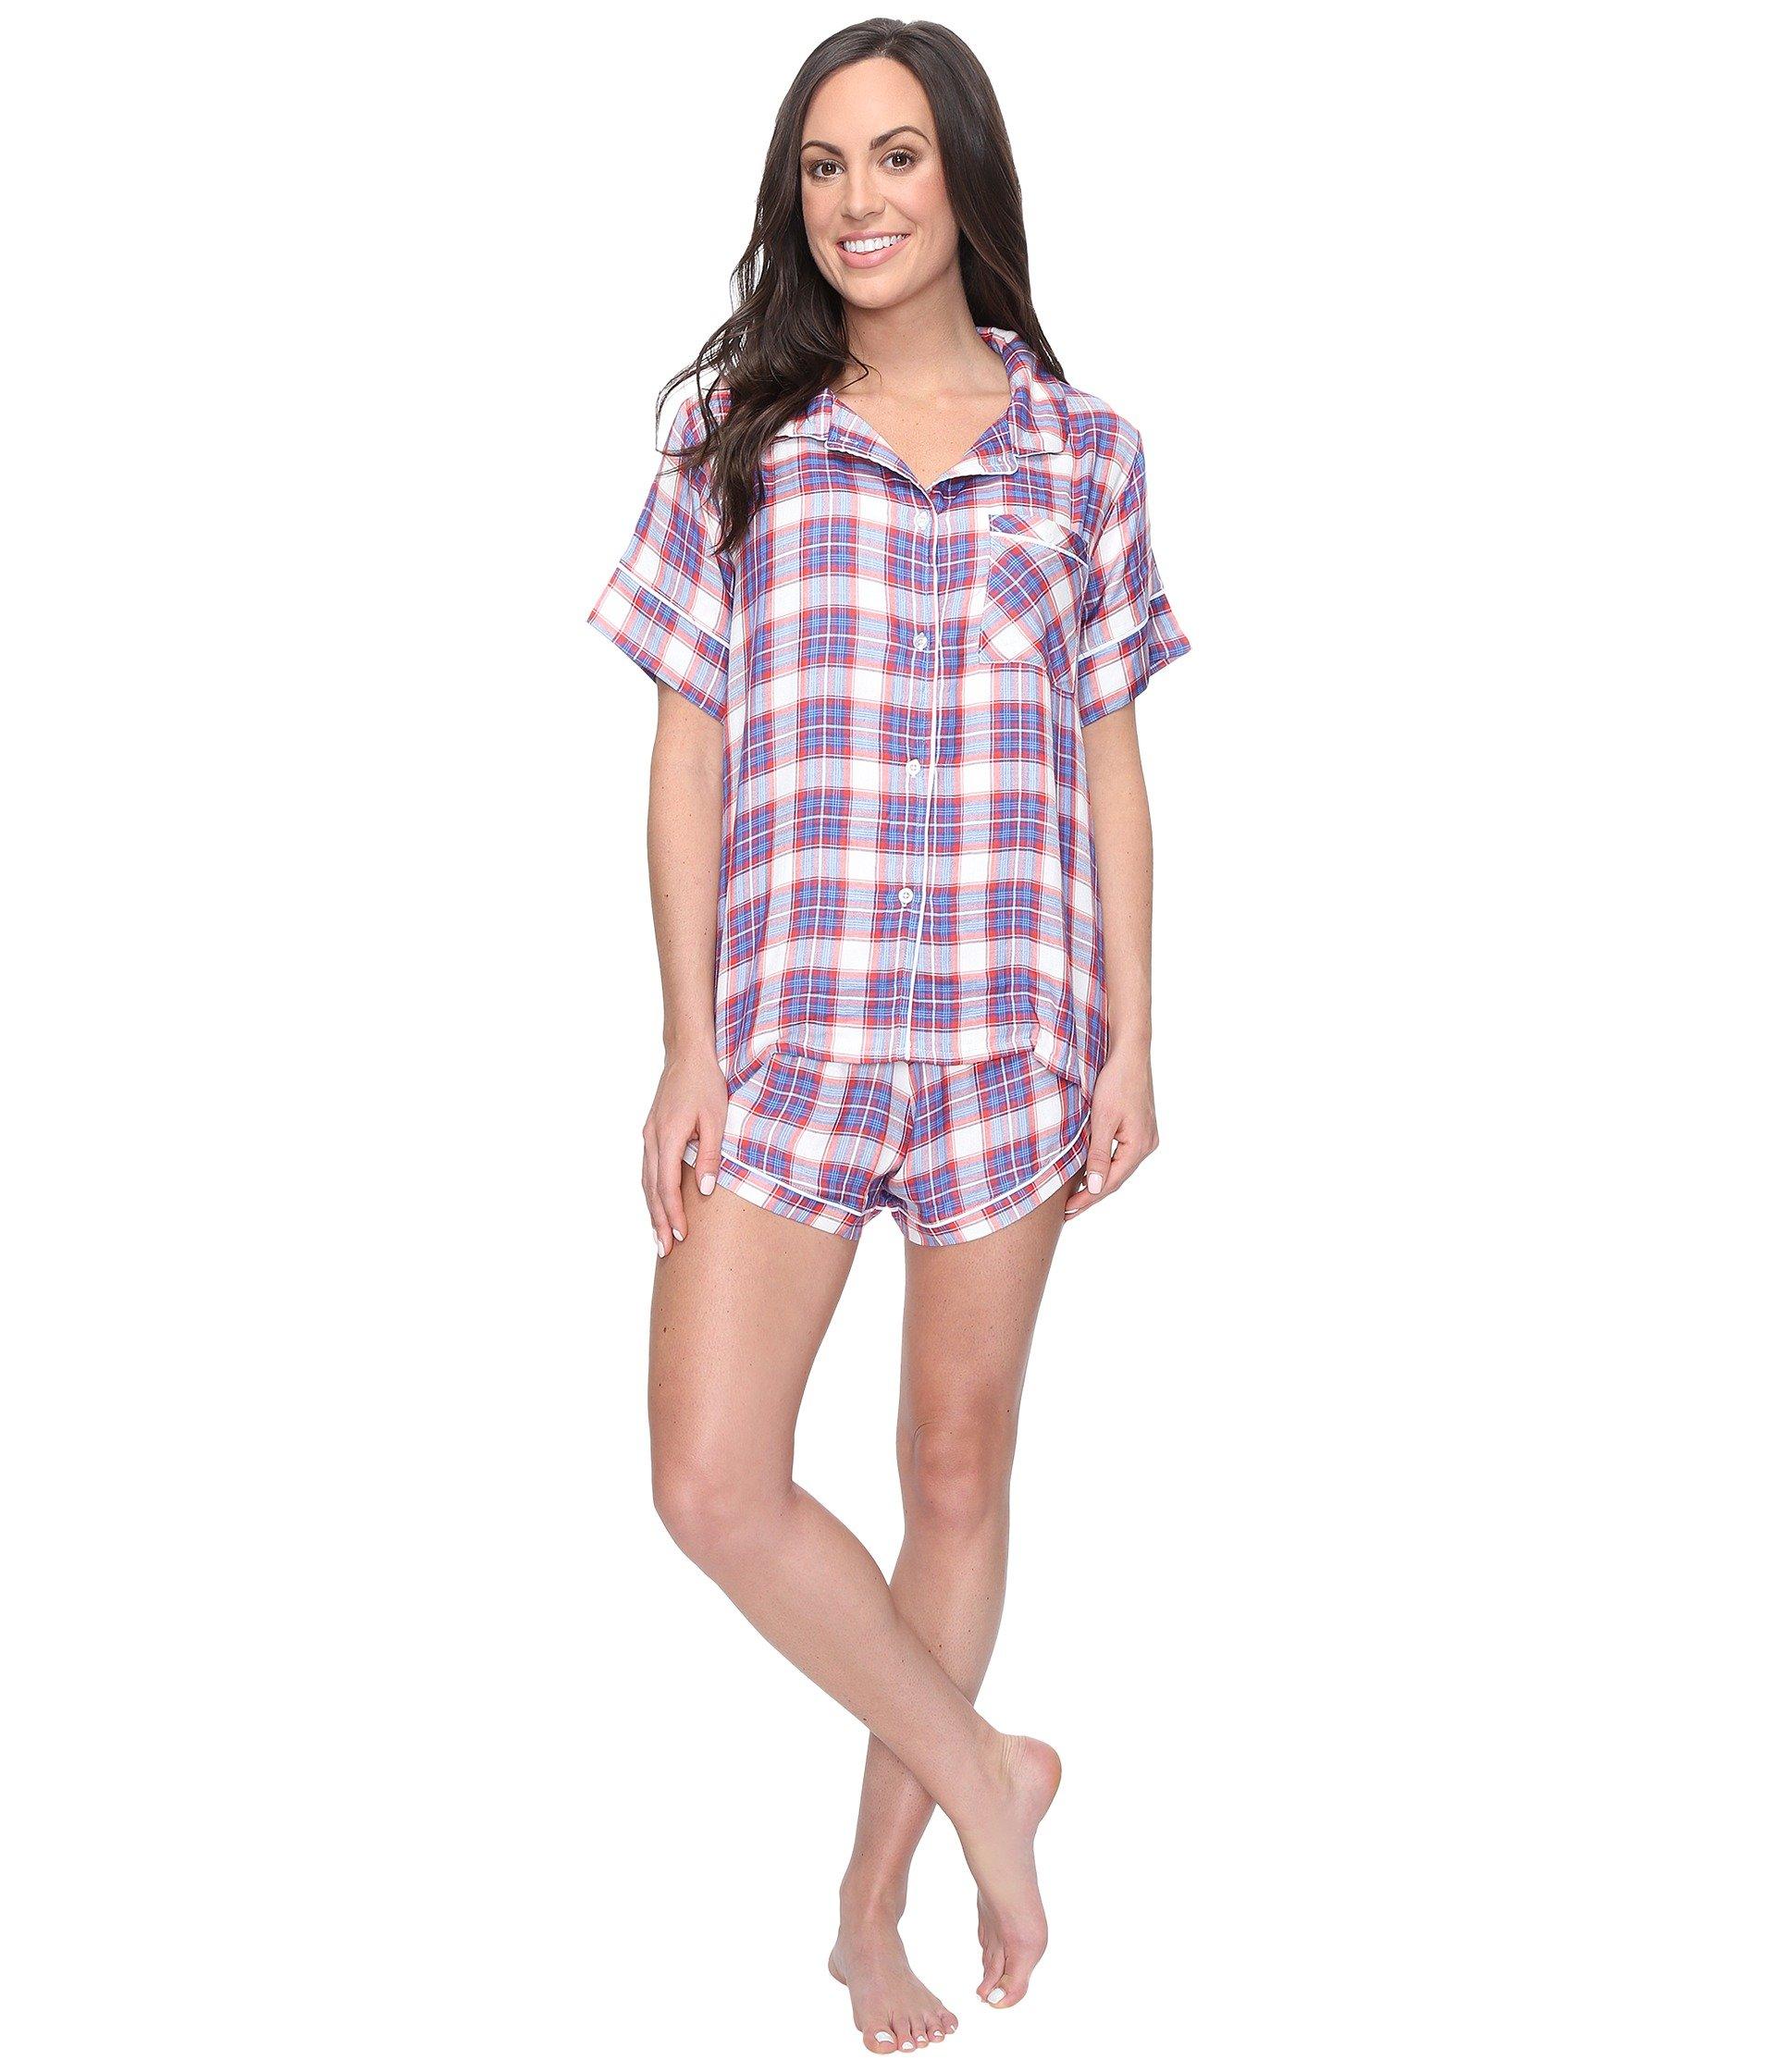 Pantalón de Pijama para Mujer Plush Ultra Soft Short Sleeve Woven Plaid PJ Set  + Plush en VeoyCompro.net